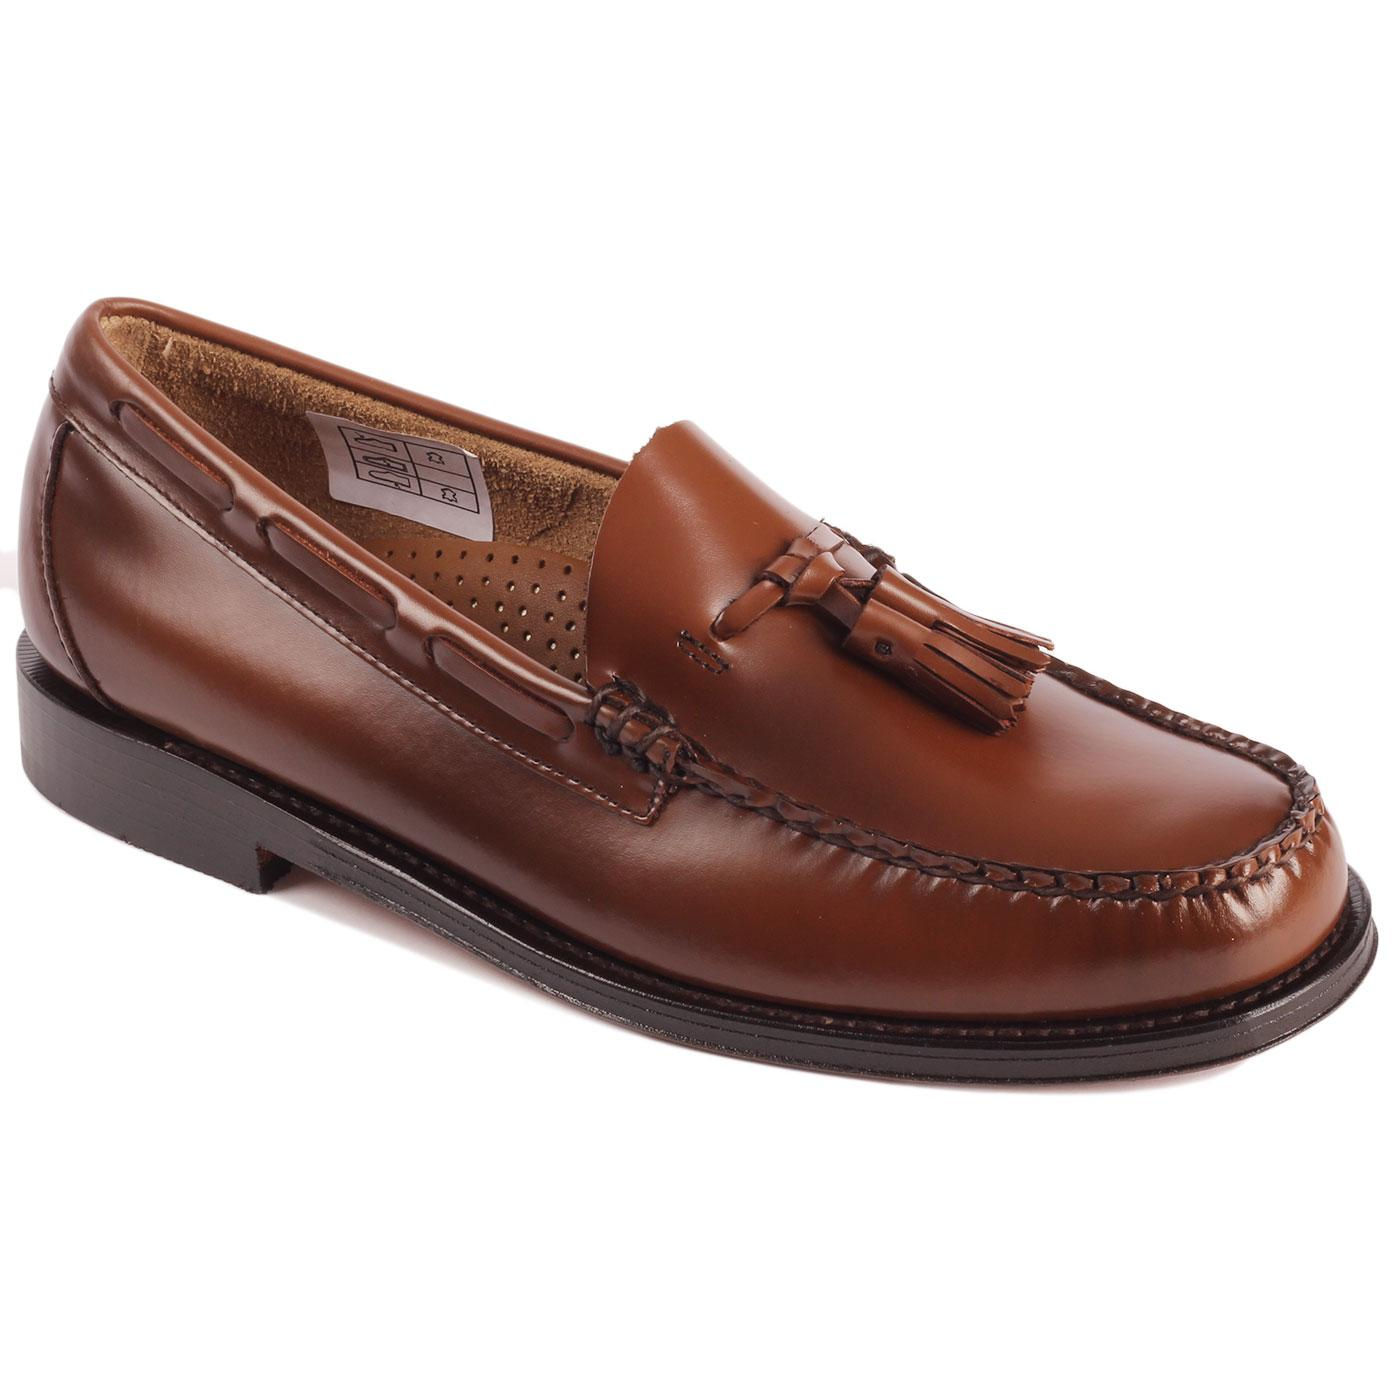 Heritage Larkin BASS WEEJUNS Tassel Loafers BROWN